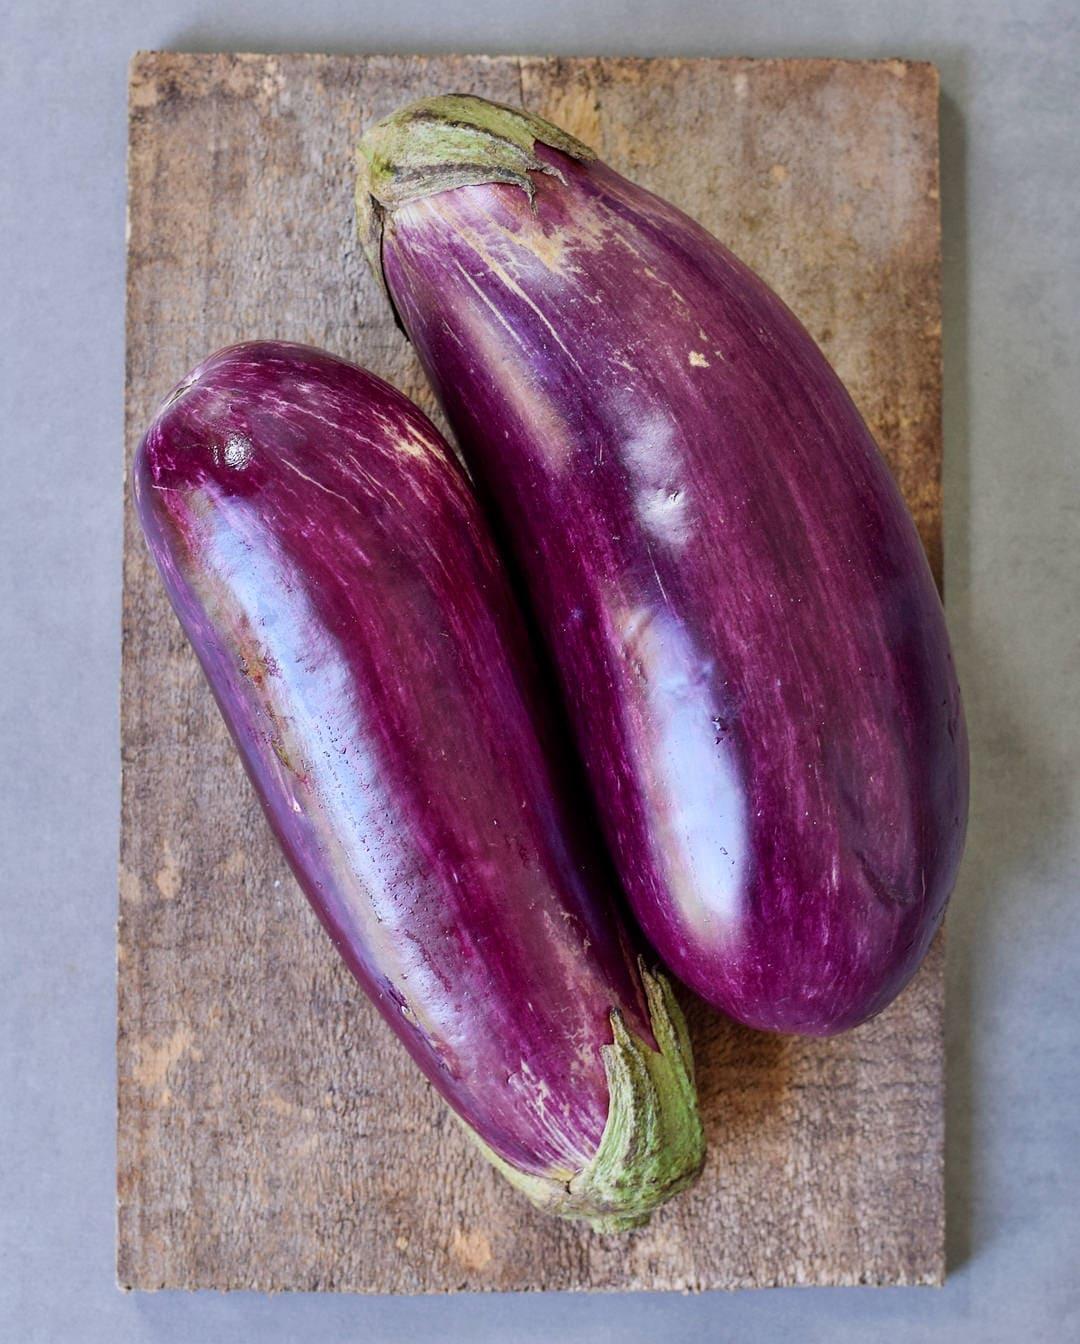 two eggplants for vegan moussaka